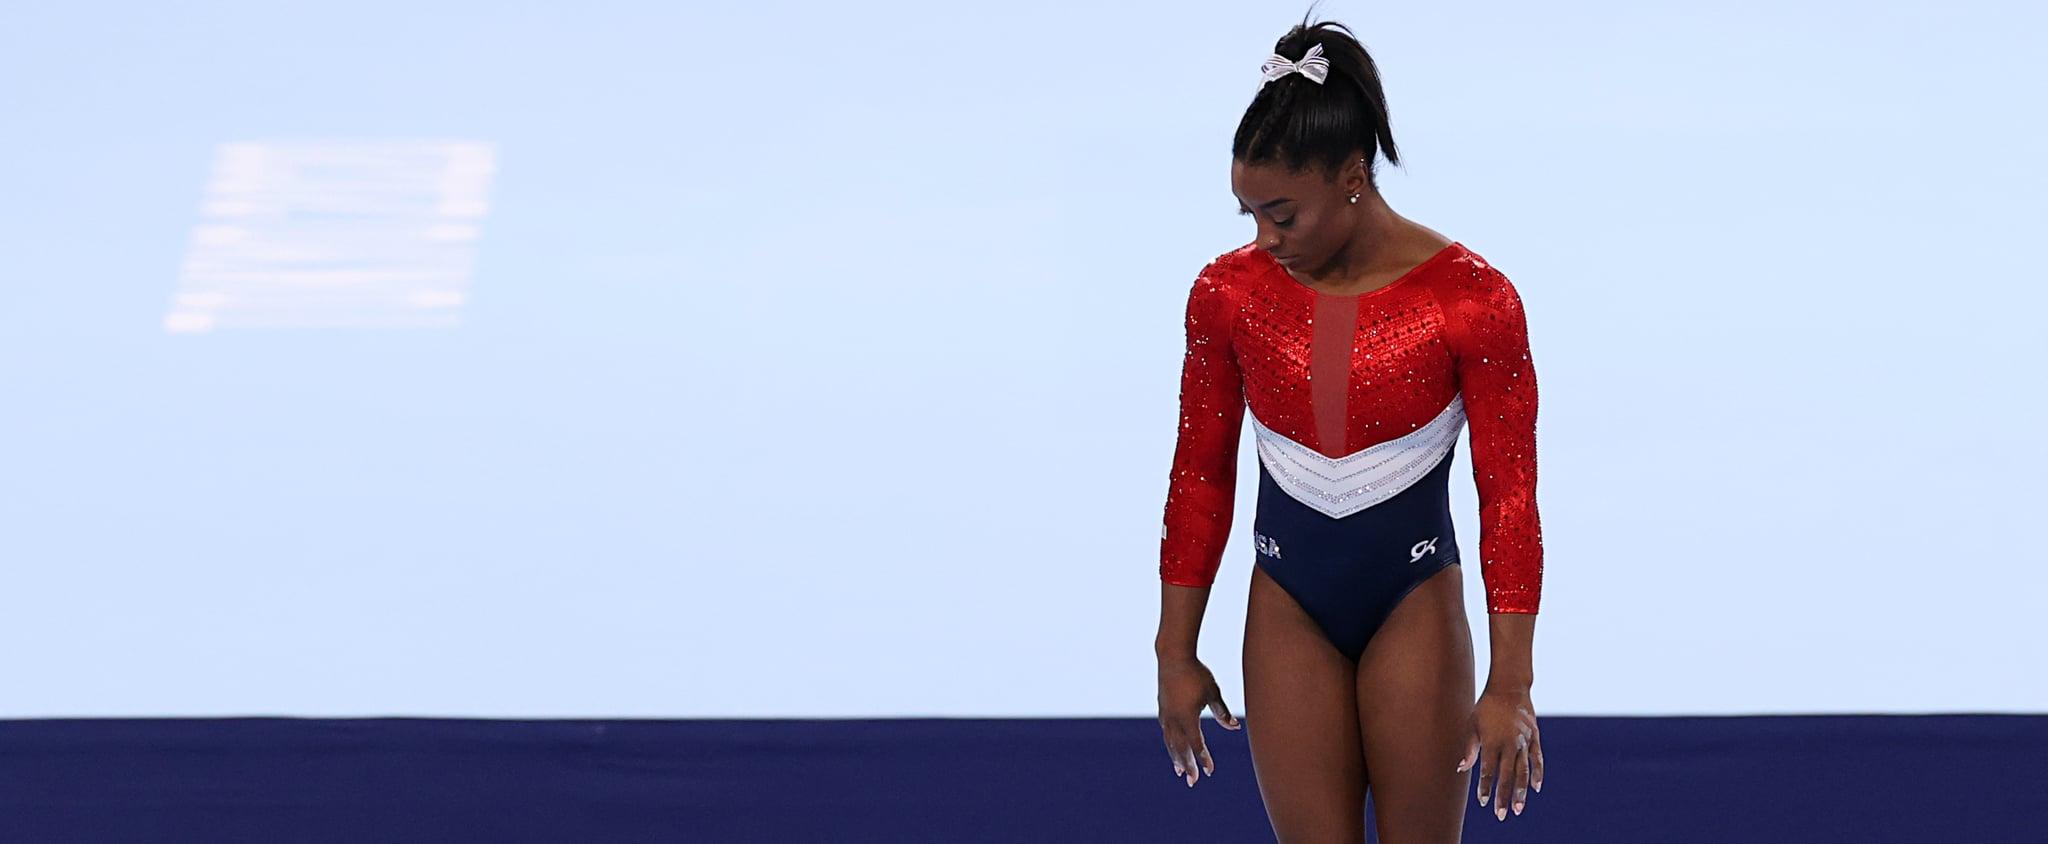 Simone Biles Withdraws From Women's Gymnastics Team Final